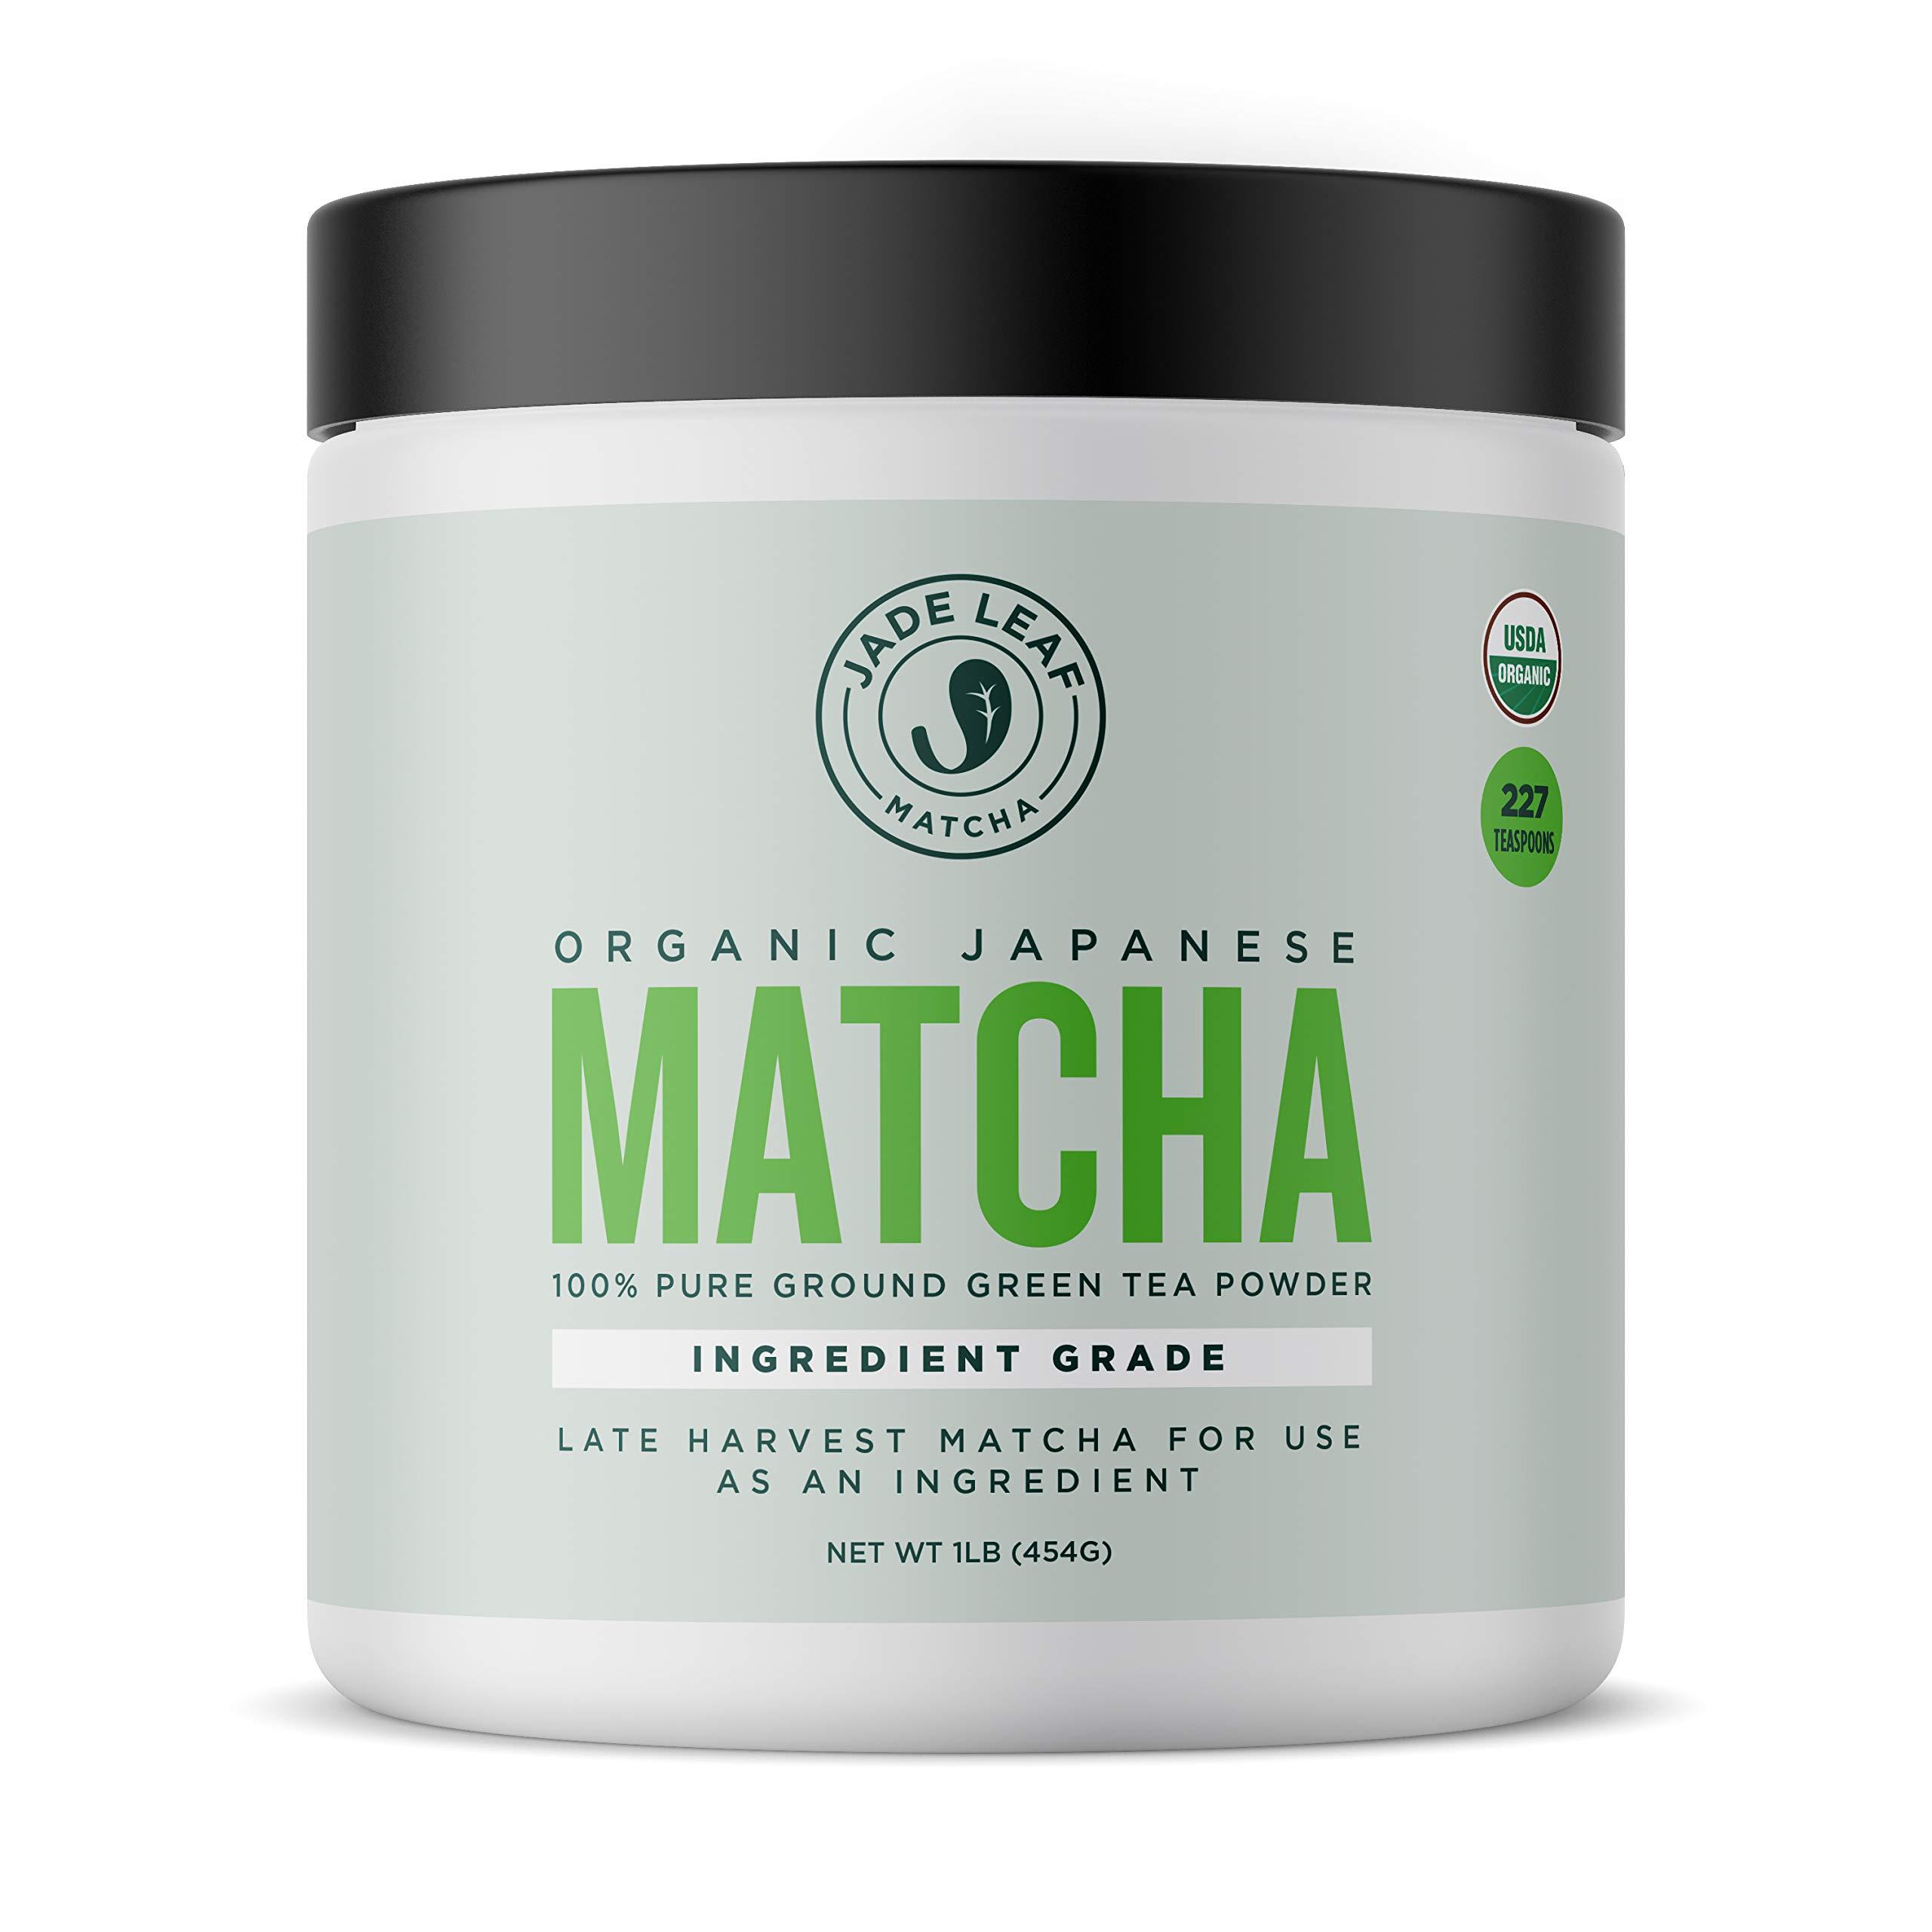 Jade Leaf - Organic Japanese Matcha Green Tea Powder, Ingredient Grade - [1lb Bulk Size] by Jade Leaf Matcha